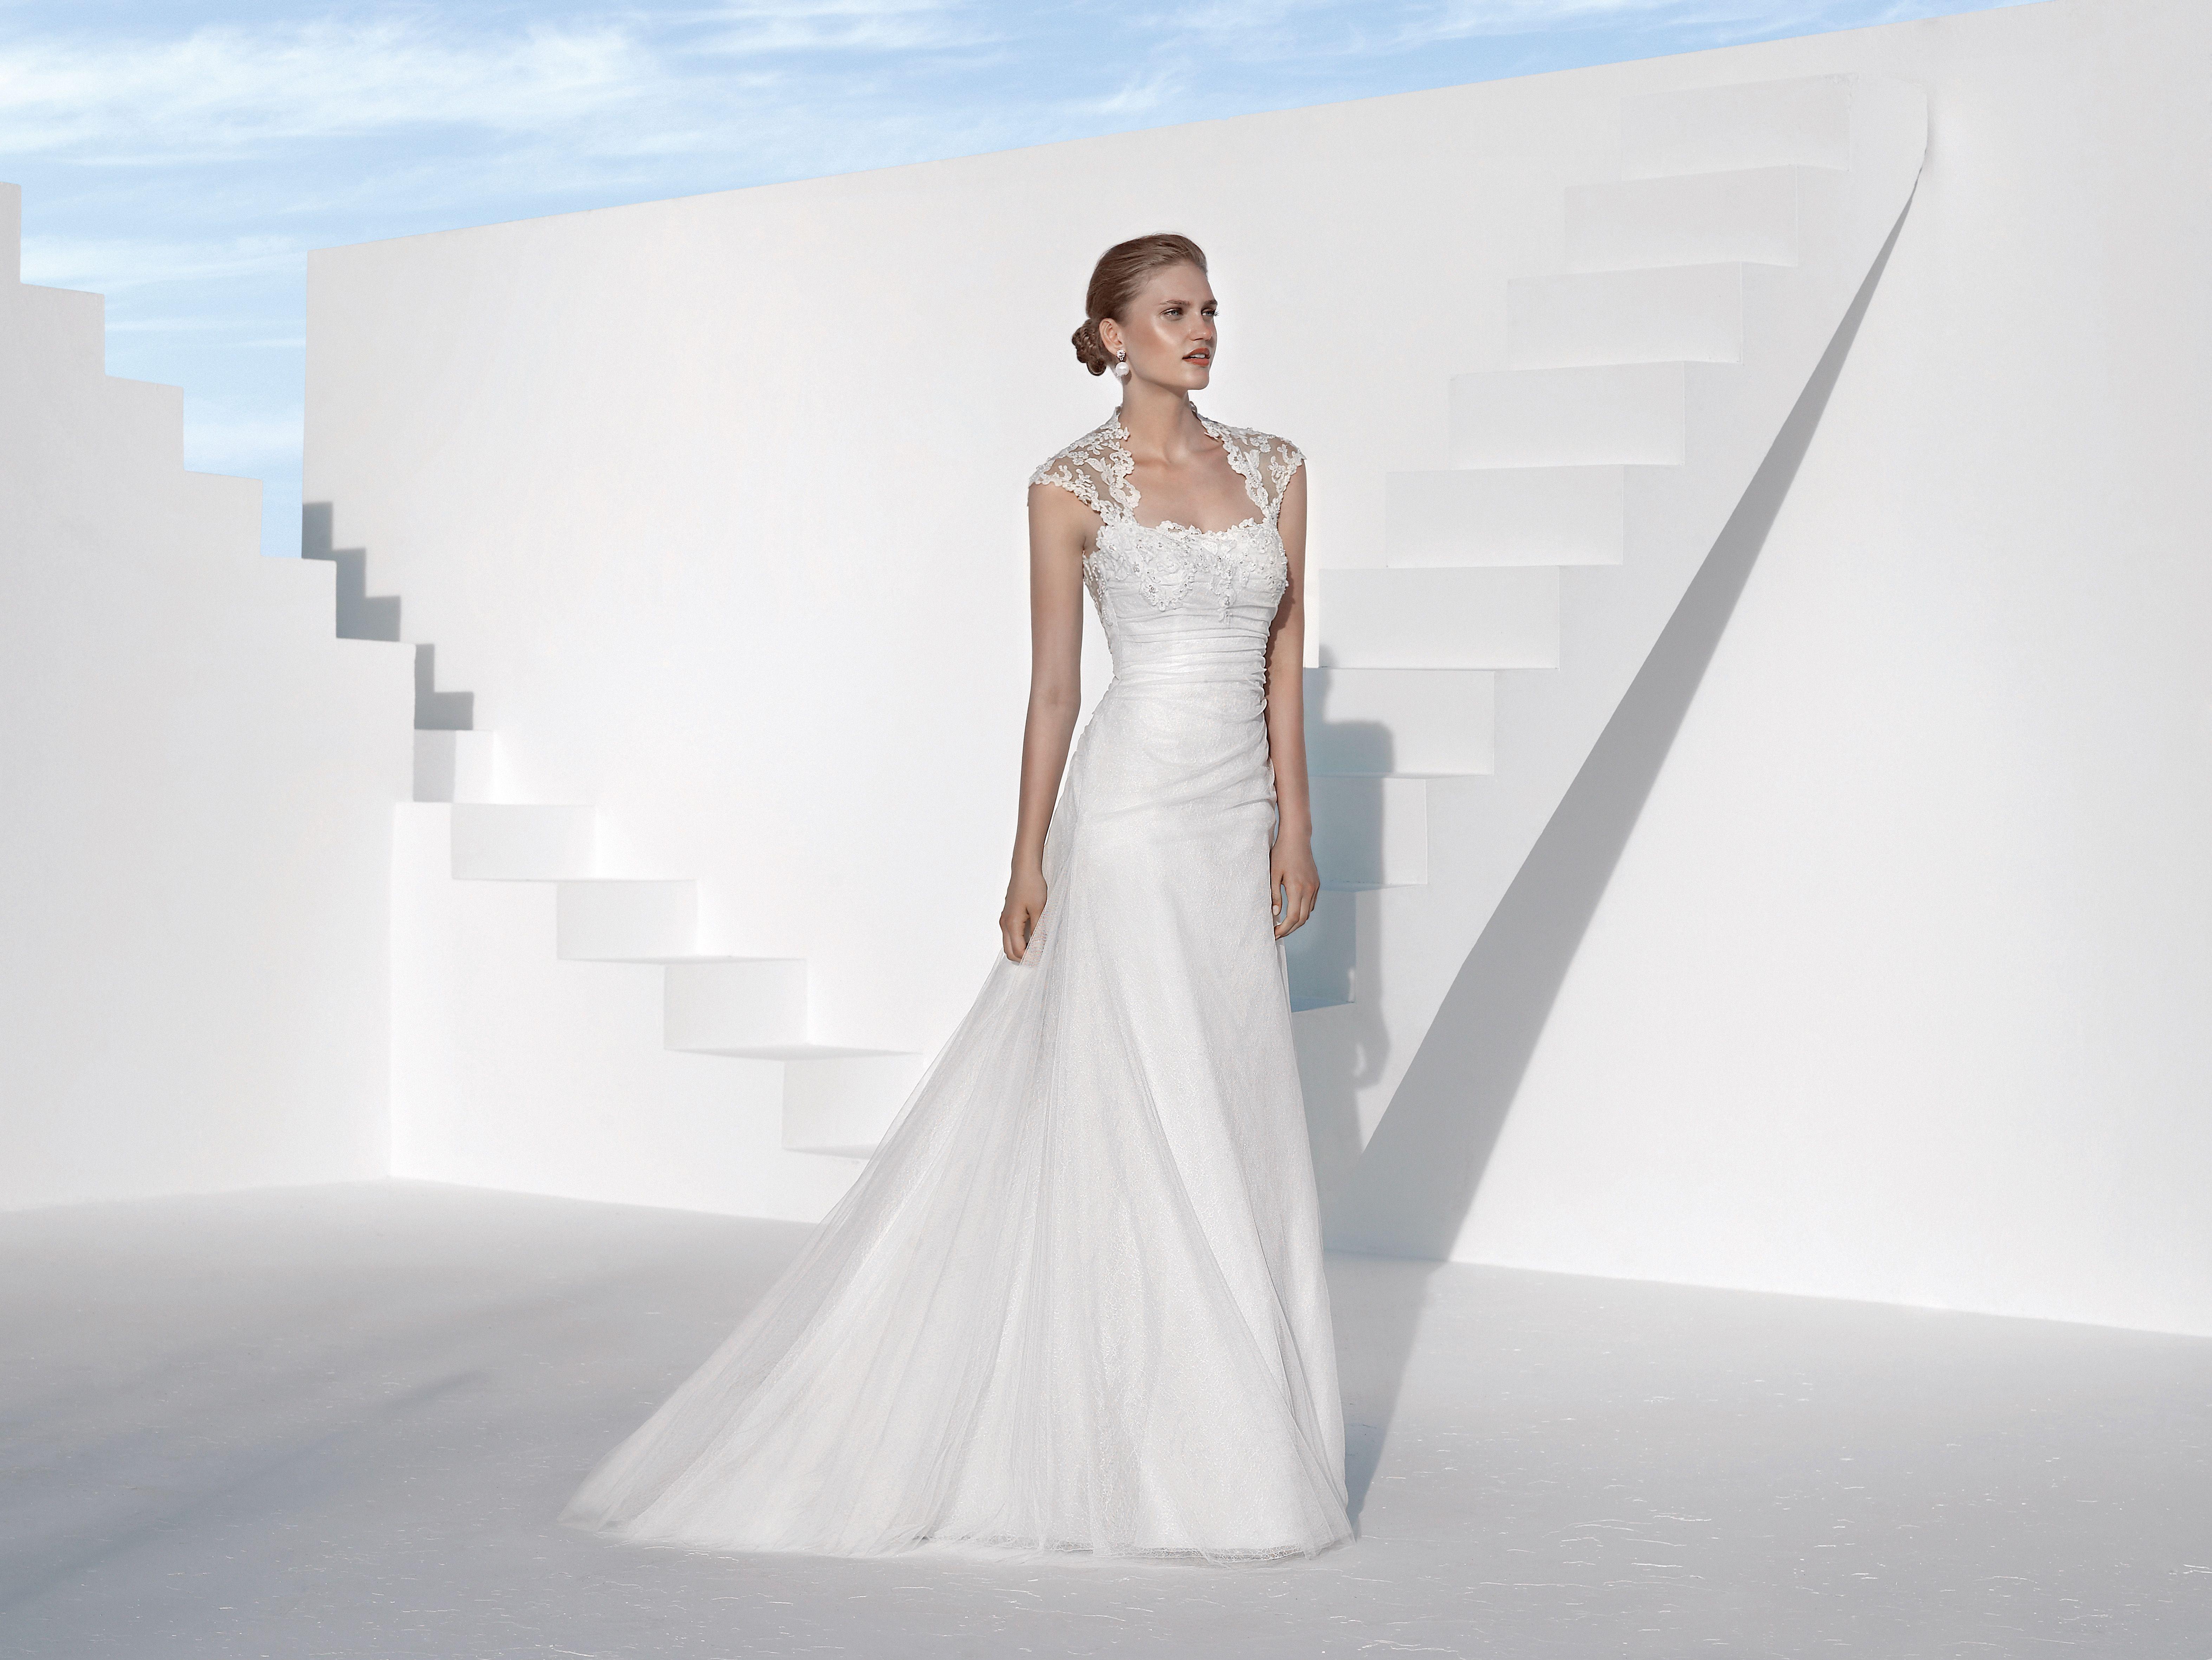 Apolinnaire Marylise Bridal Gowns And Wedding Dresses Marylisebridal Newcollection: Smoking Brides Wedding Dress At Websimilar.org